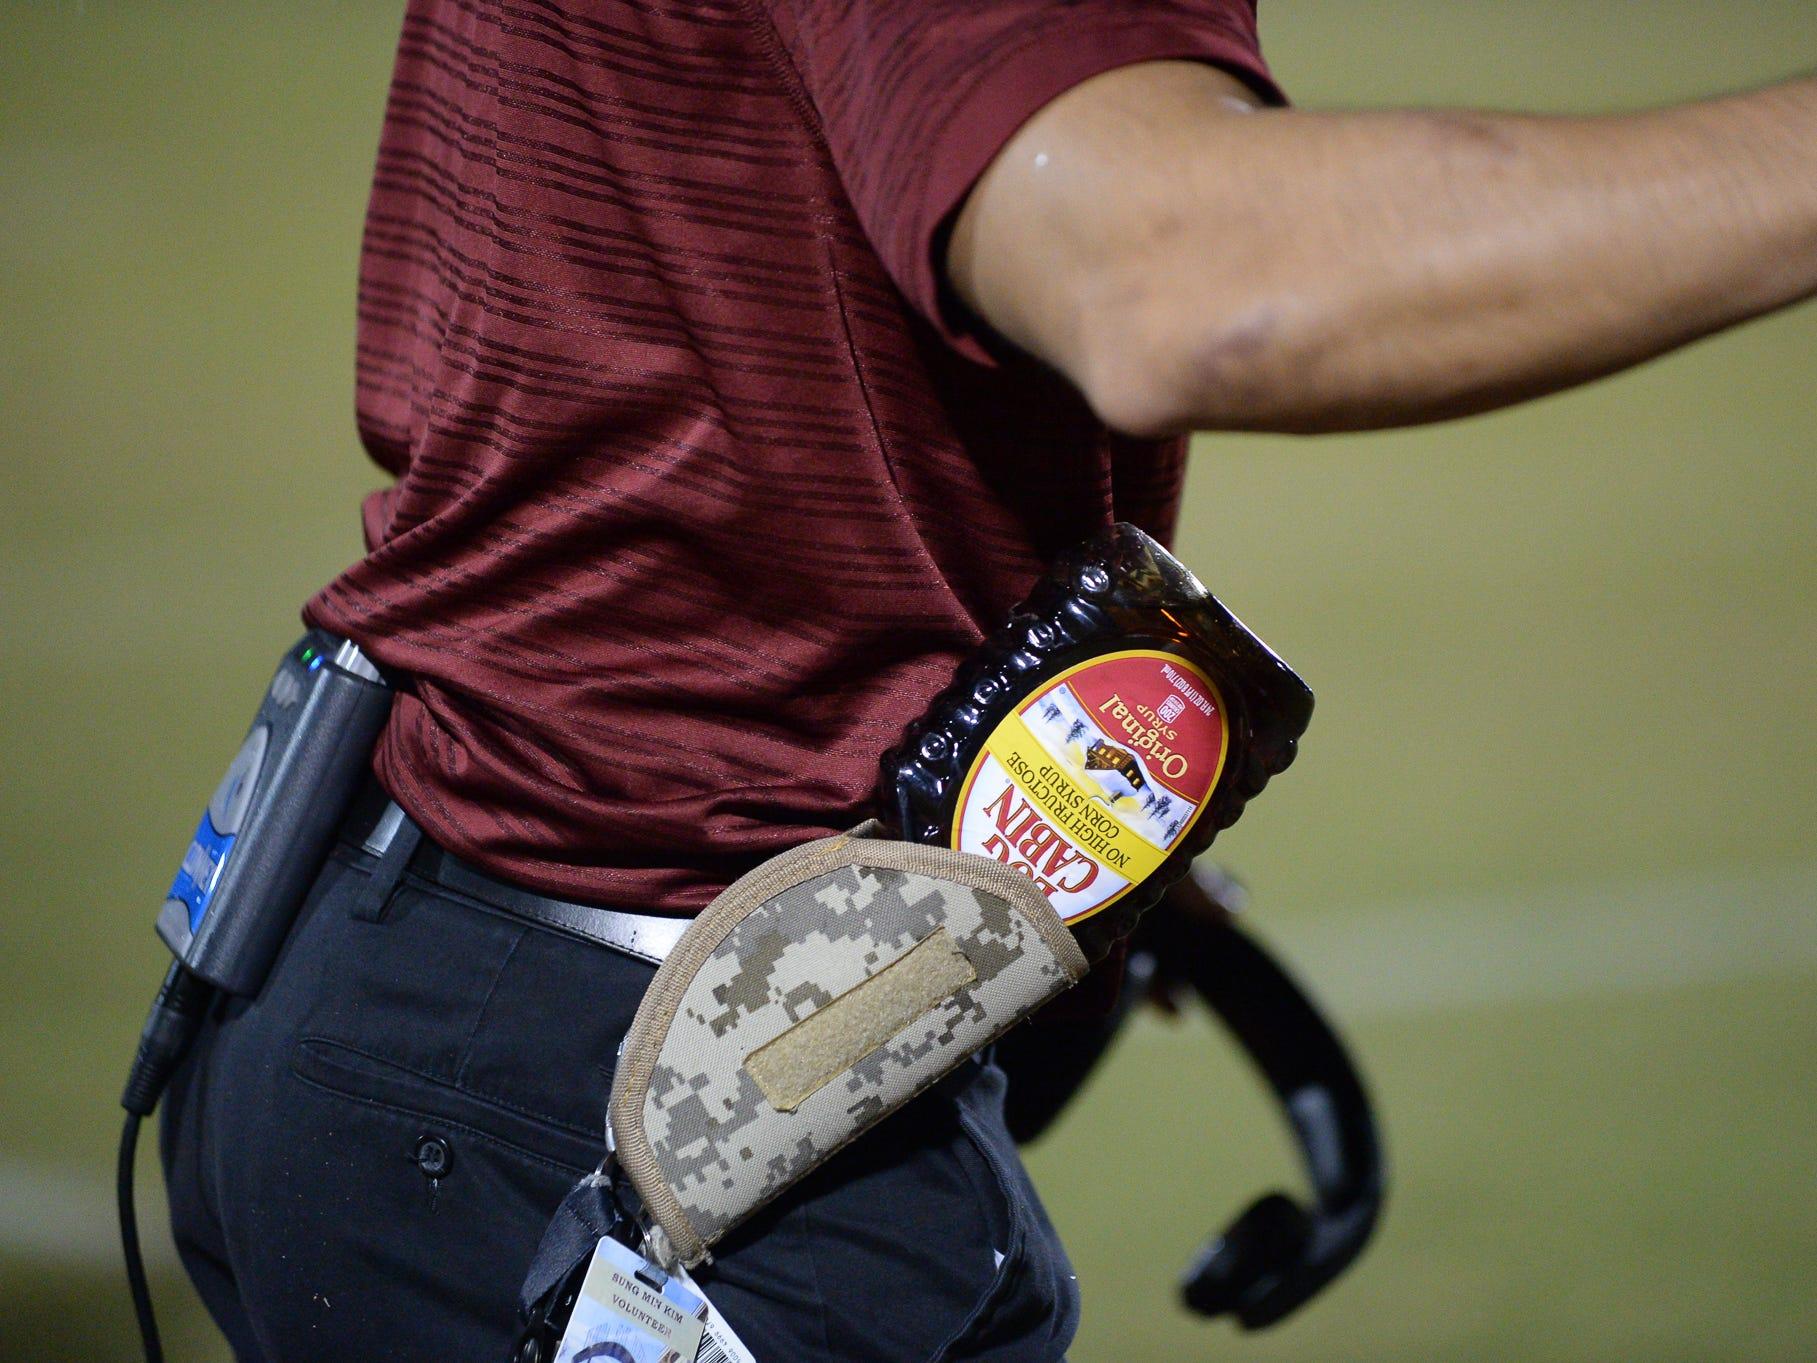 King's Academy Lions vs. Florida High Seminoles, Class 3A state semifinal, Tallahassee, FL, Nov. 30, 2018.